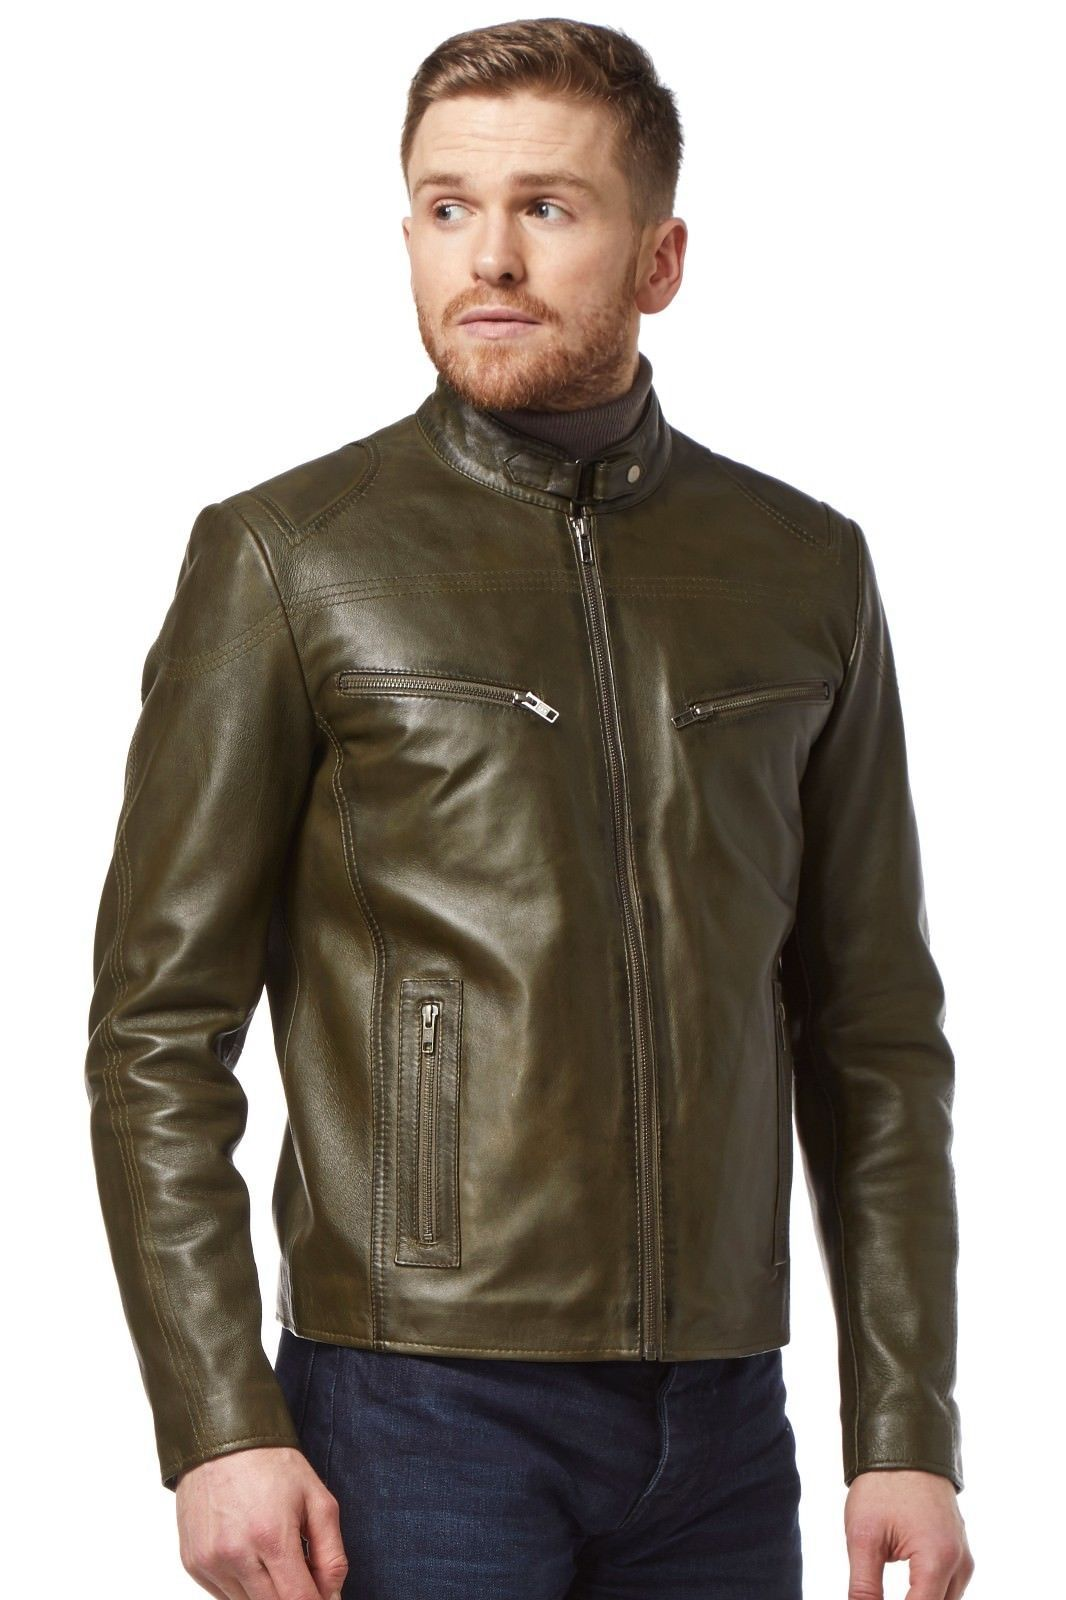 Speed Men S Real Leather Jacket Olive Green Washed Biker Motorcycle Style Sr 02 Ebay Olive Green Leather Jacket Leather Jacket Men Leather Jacket [ 1600 x 1066 Pixel ]